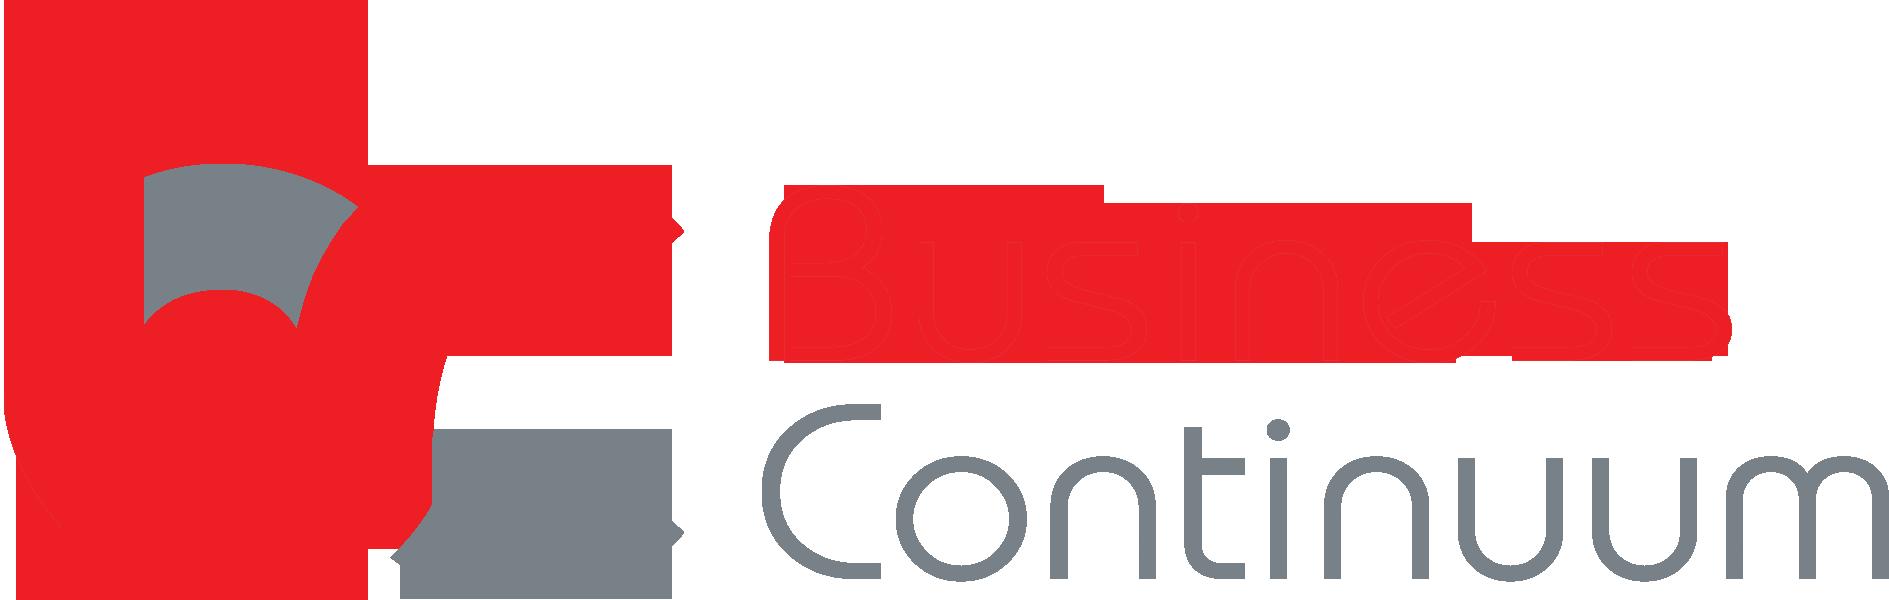 Business Continuum - logo